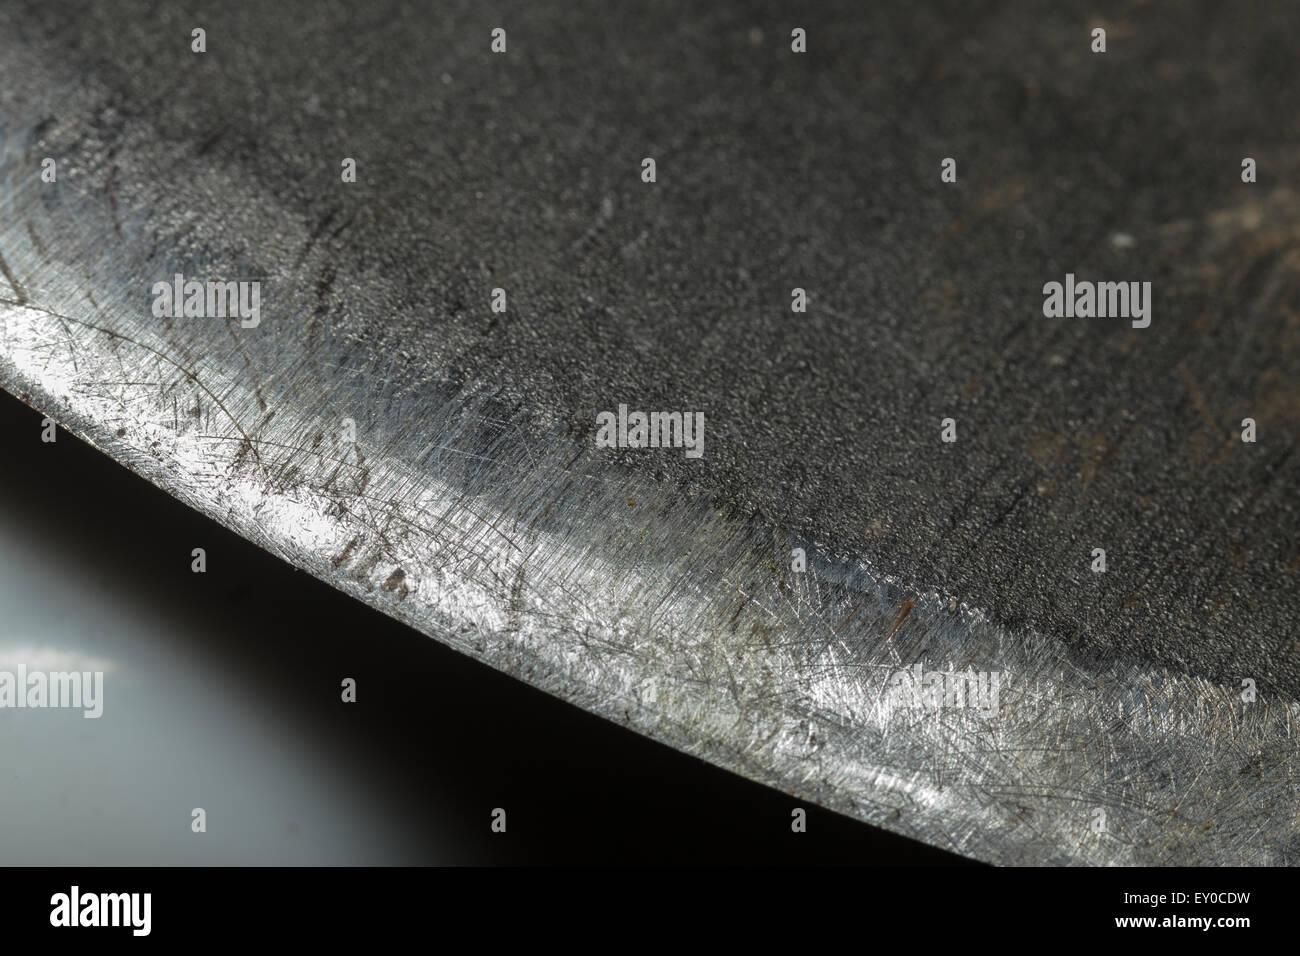 Macro Photo of Axe Blade - Stock Image